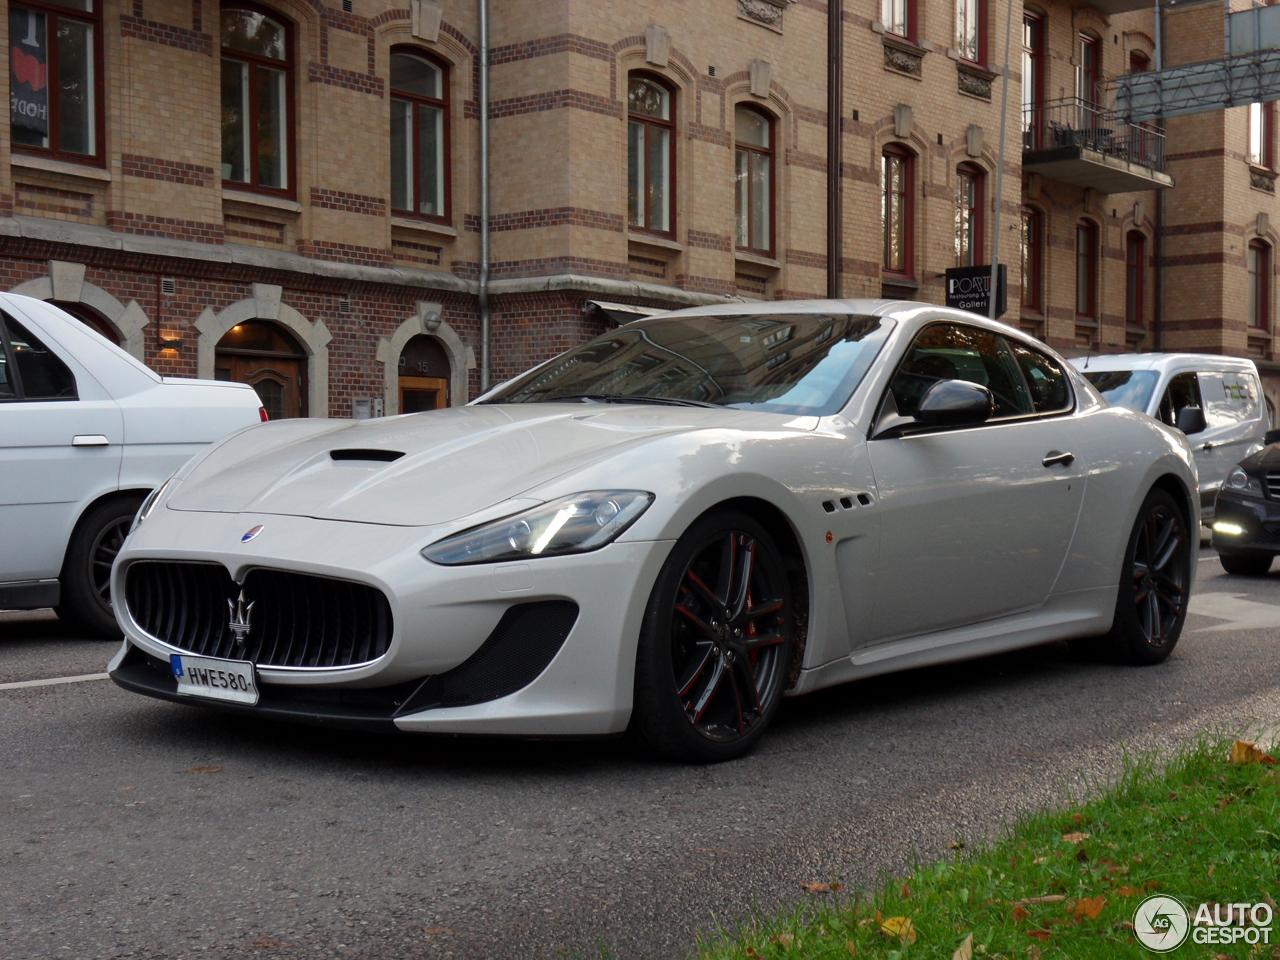 Maserati GranTurismo MC Centennial Edition - 5 December ...